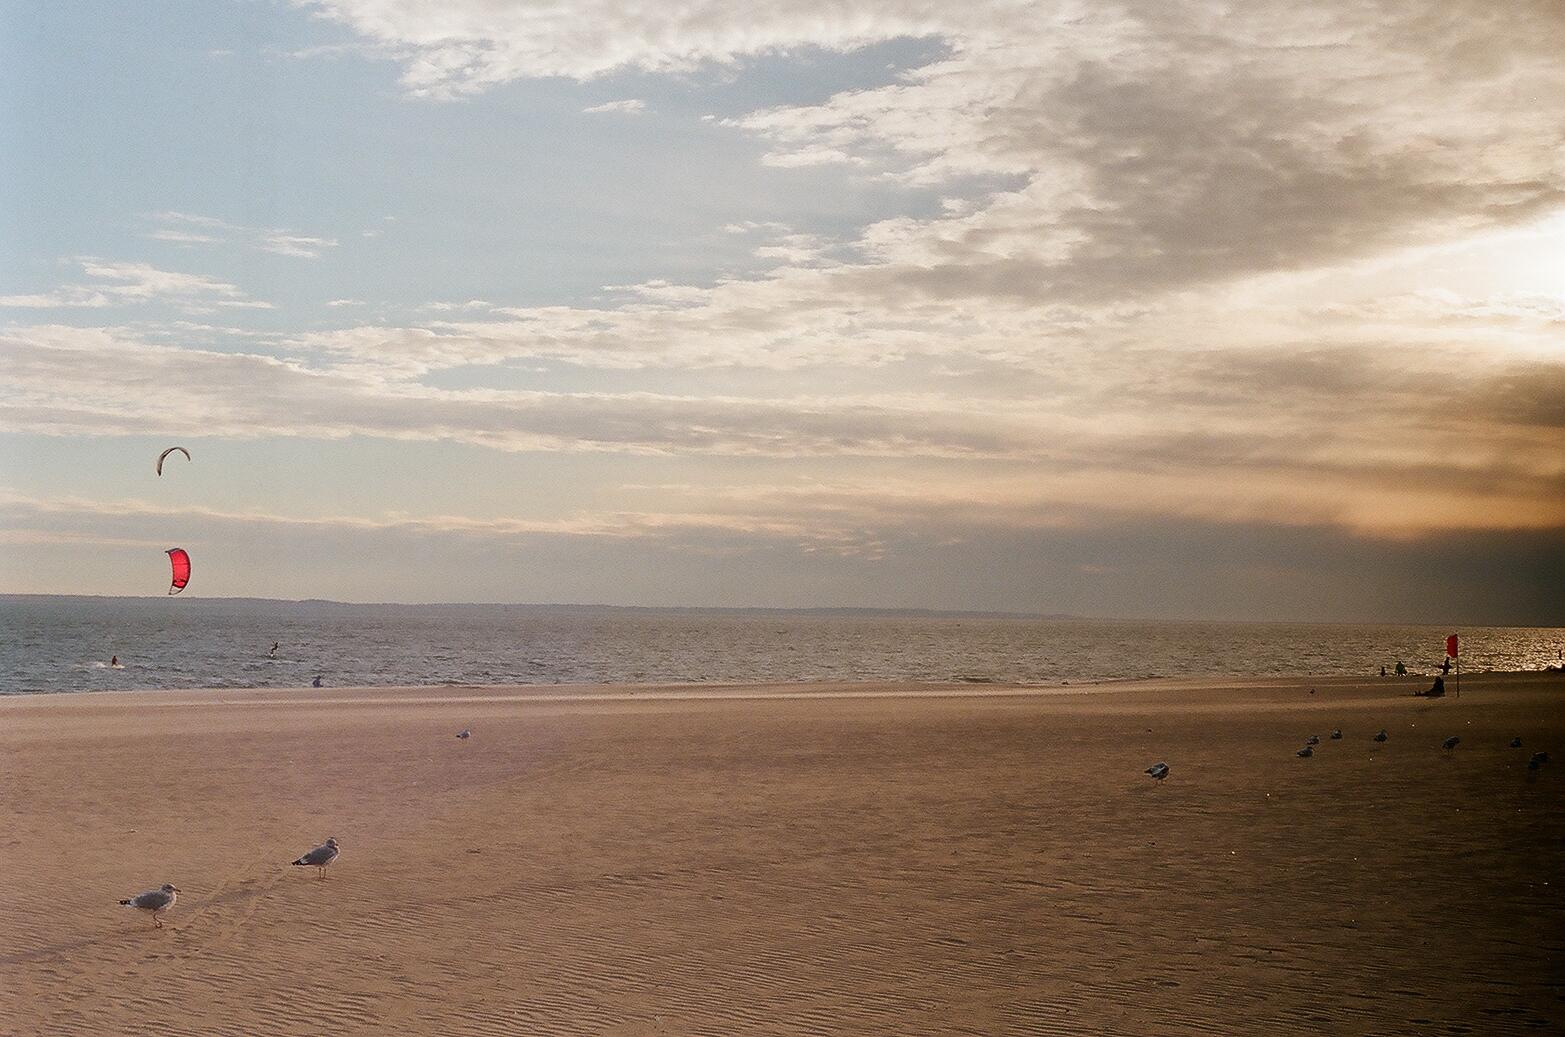 Brighton Beach Kite Surfer-NYC-2018-Canon TL-Film Photography-Jo